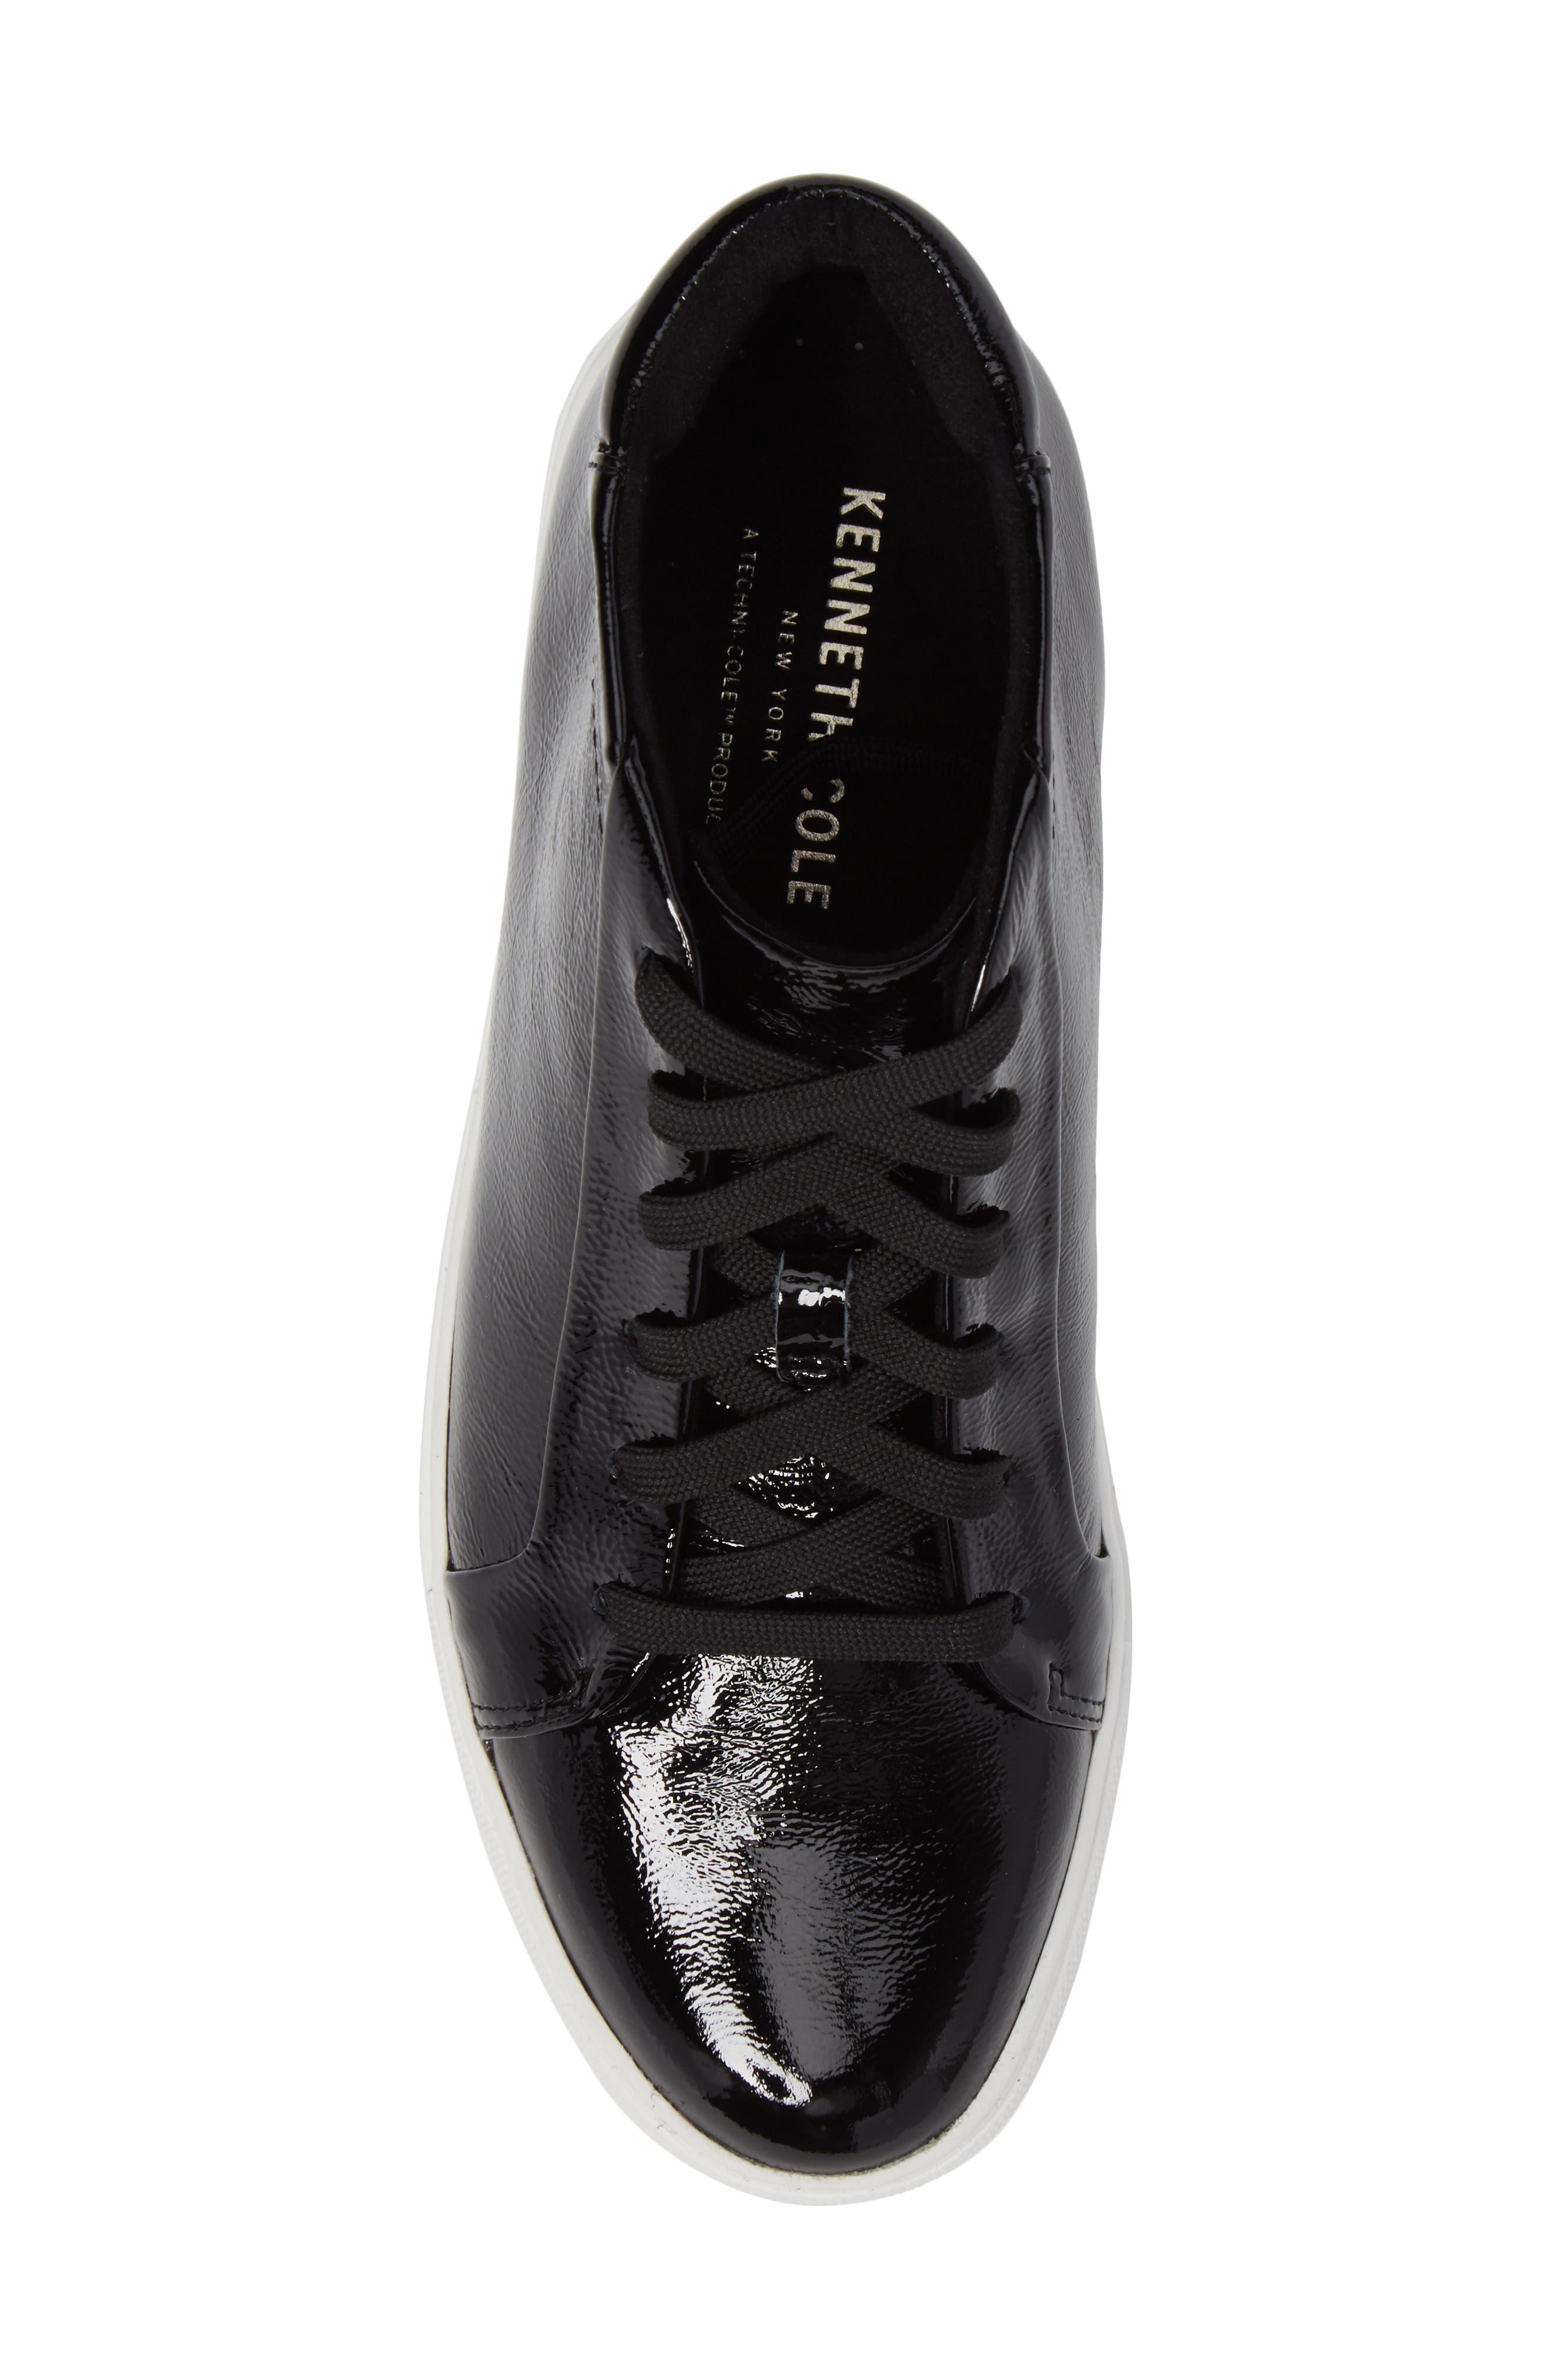 Janette High Top Platform Sneaker,                             Alternate thumbnail 5, color,                             BLACK PATENT LEATHER